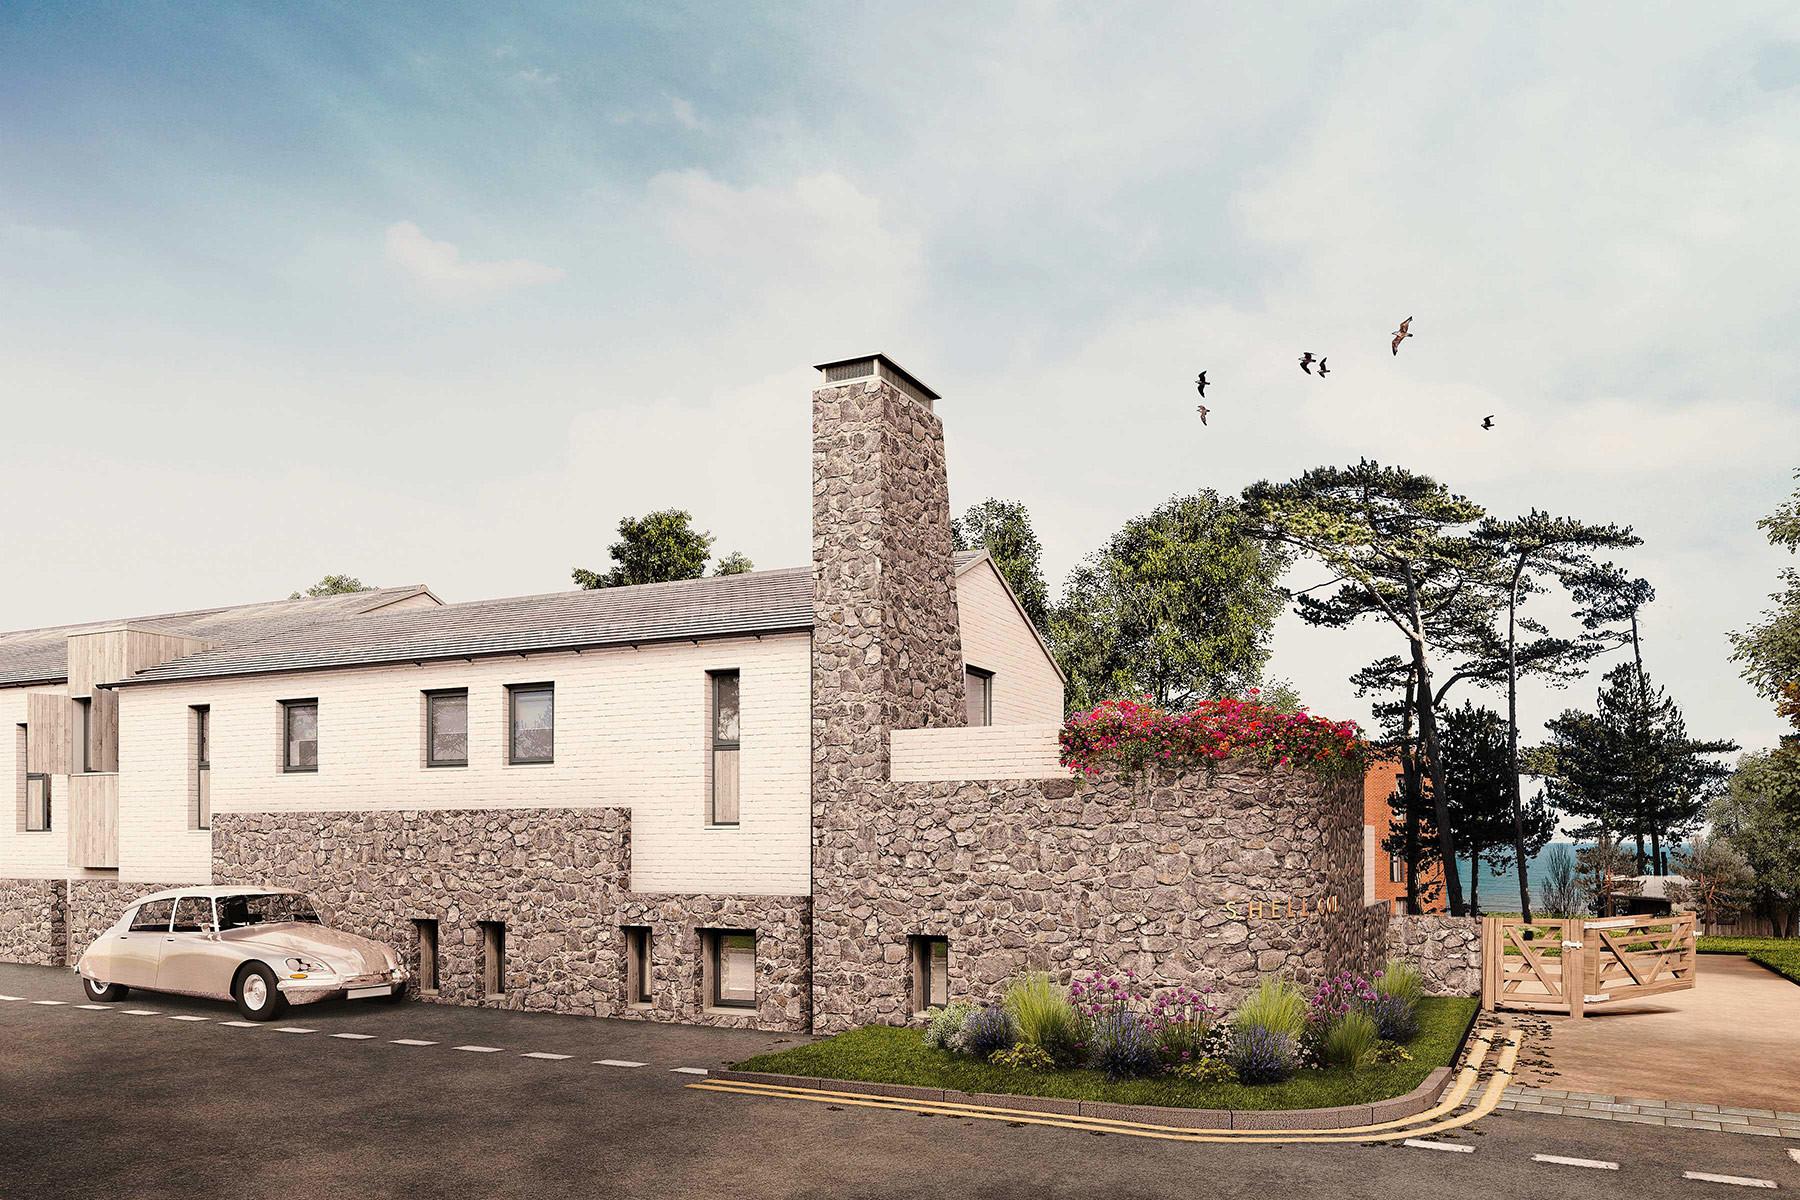 Sarah-Wigglesworth-Architects Shell-Cove-IC Street 1800